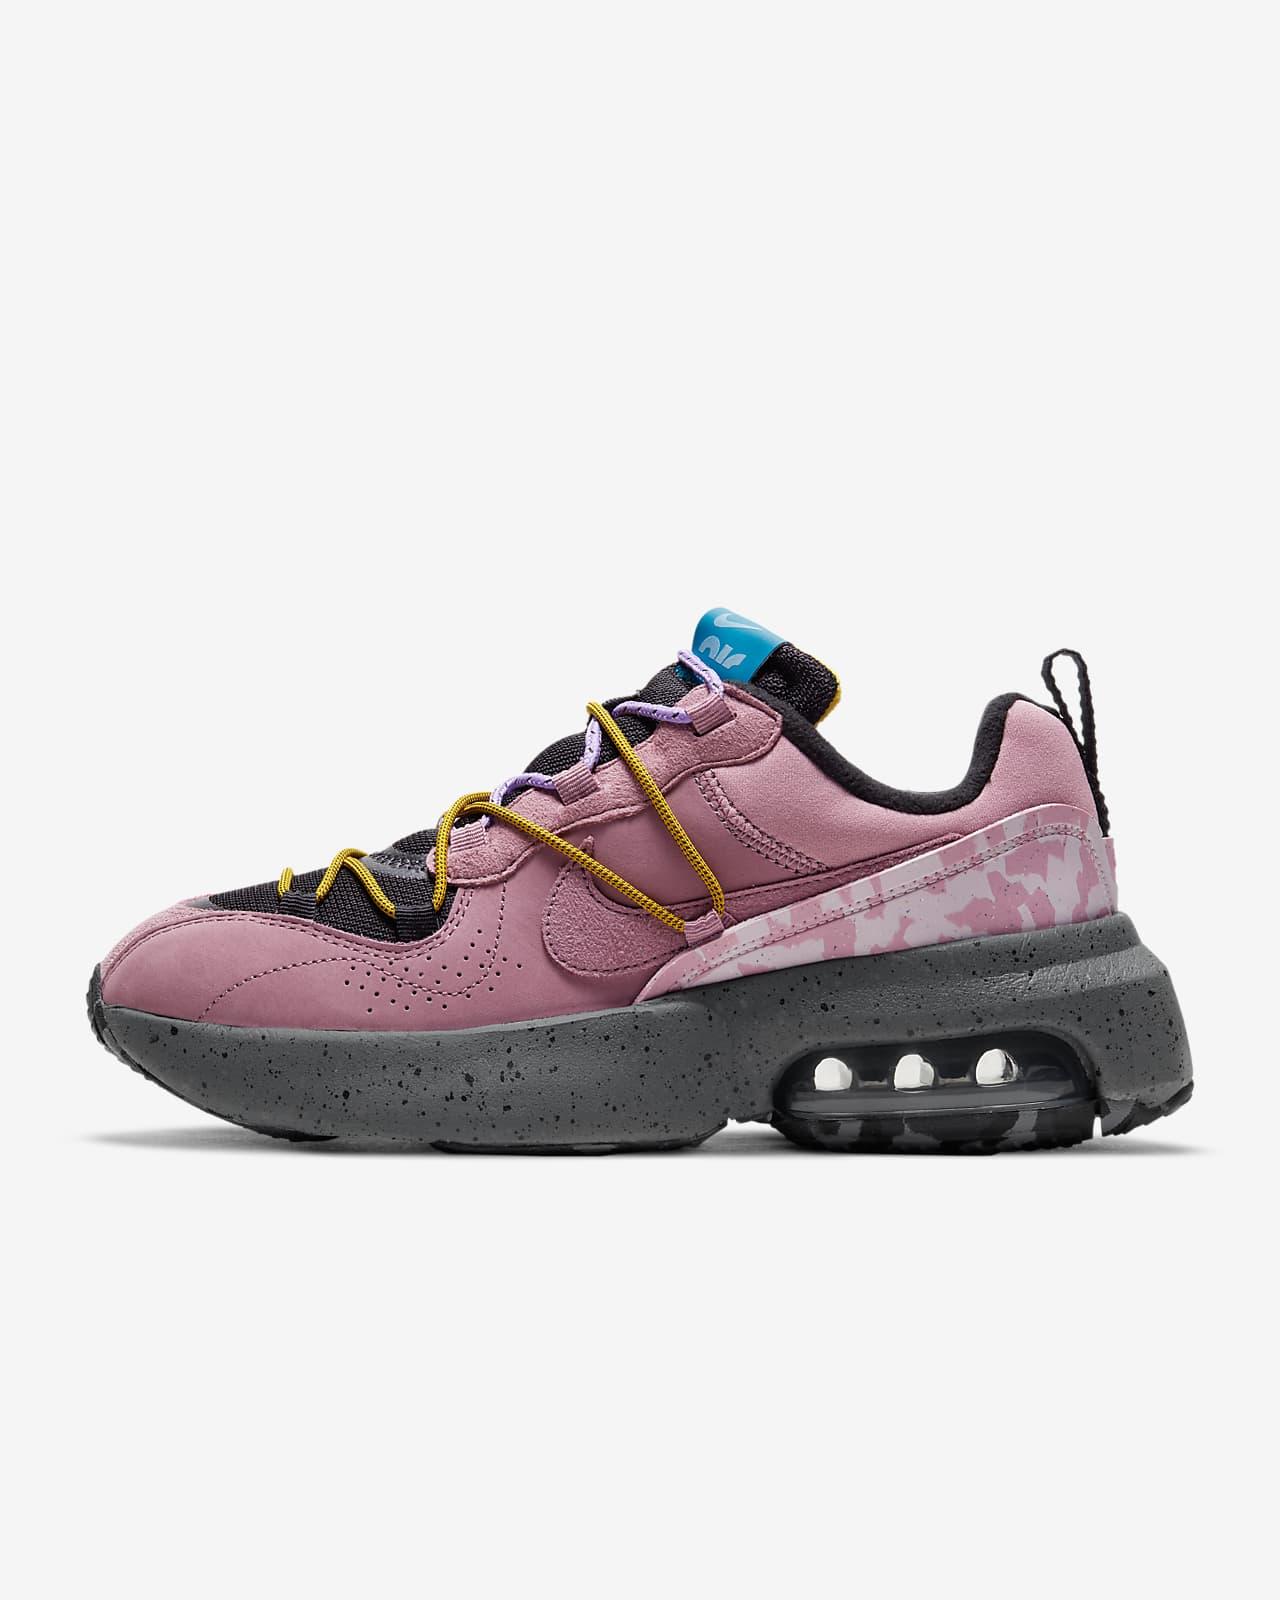 Nike Air Max Viva-sko til kvinder